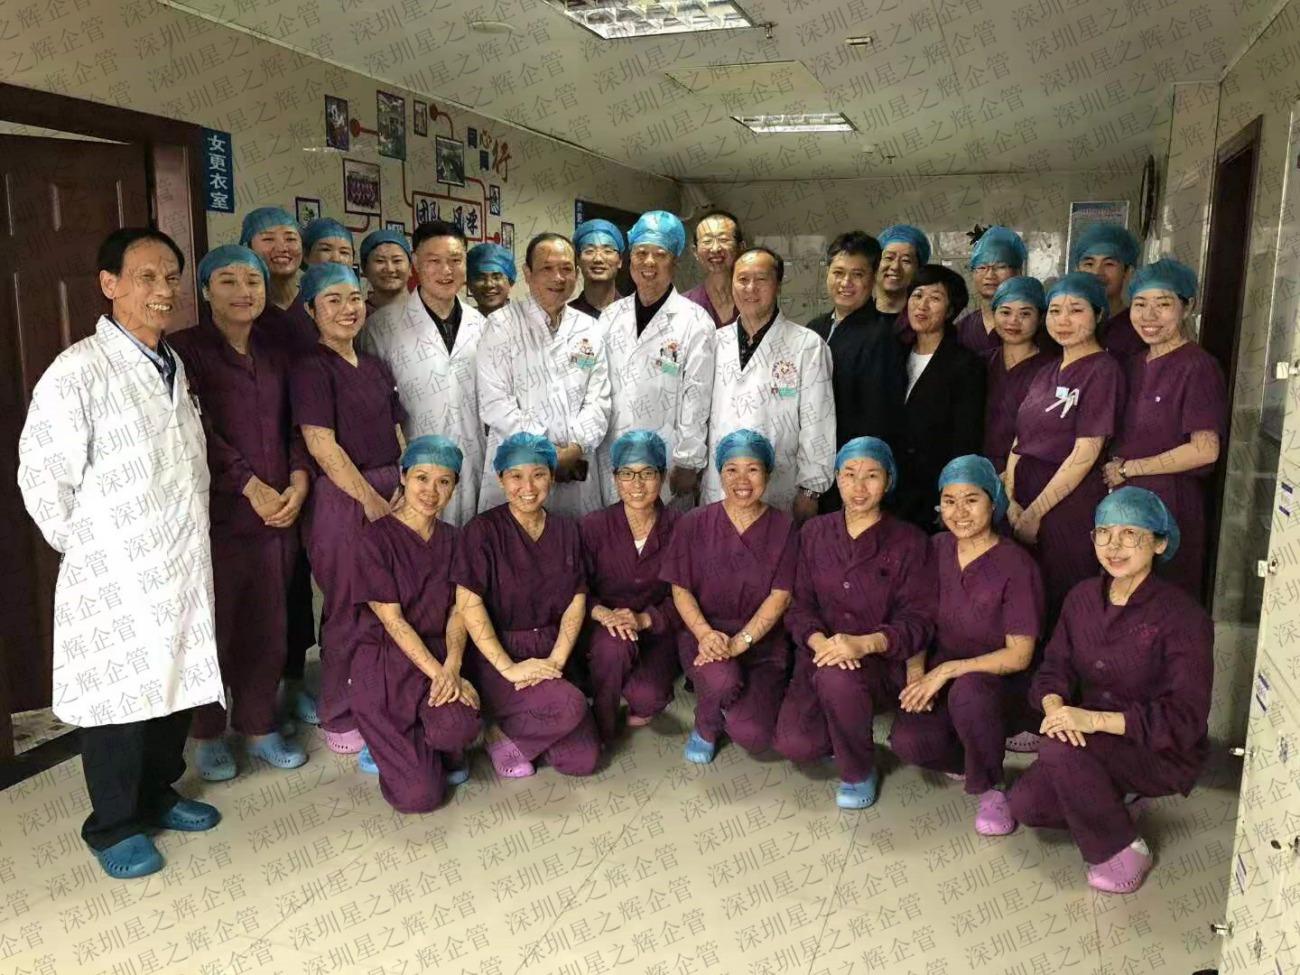 6S精益管理宜春市第二人民醫院第二批推廣科室成功驗收